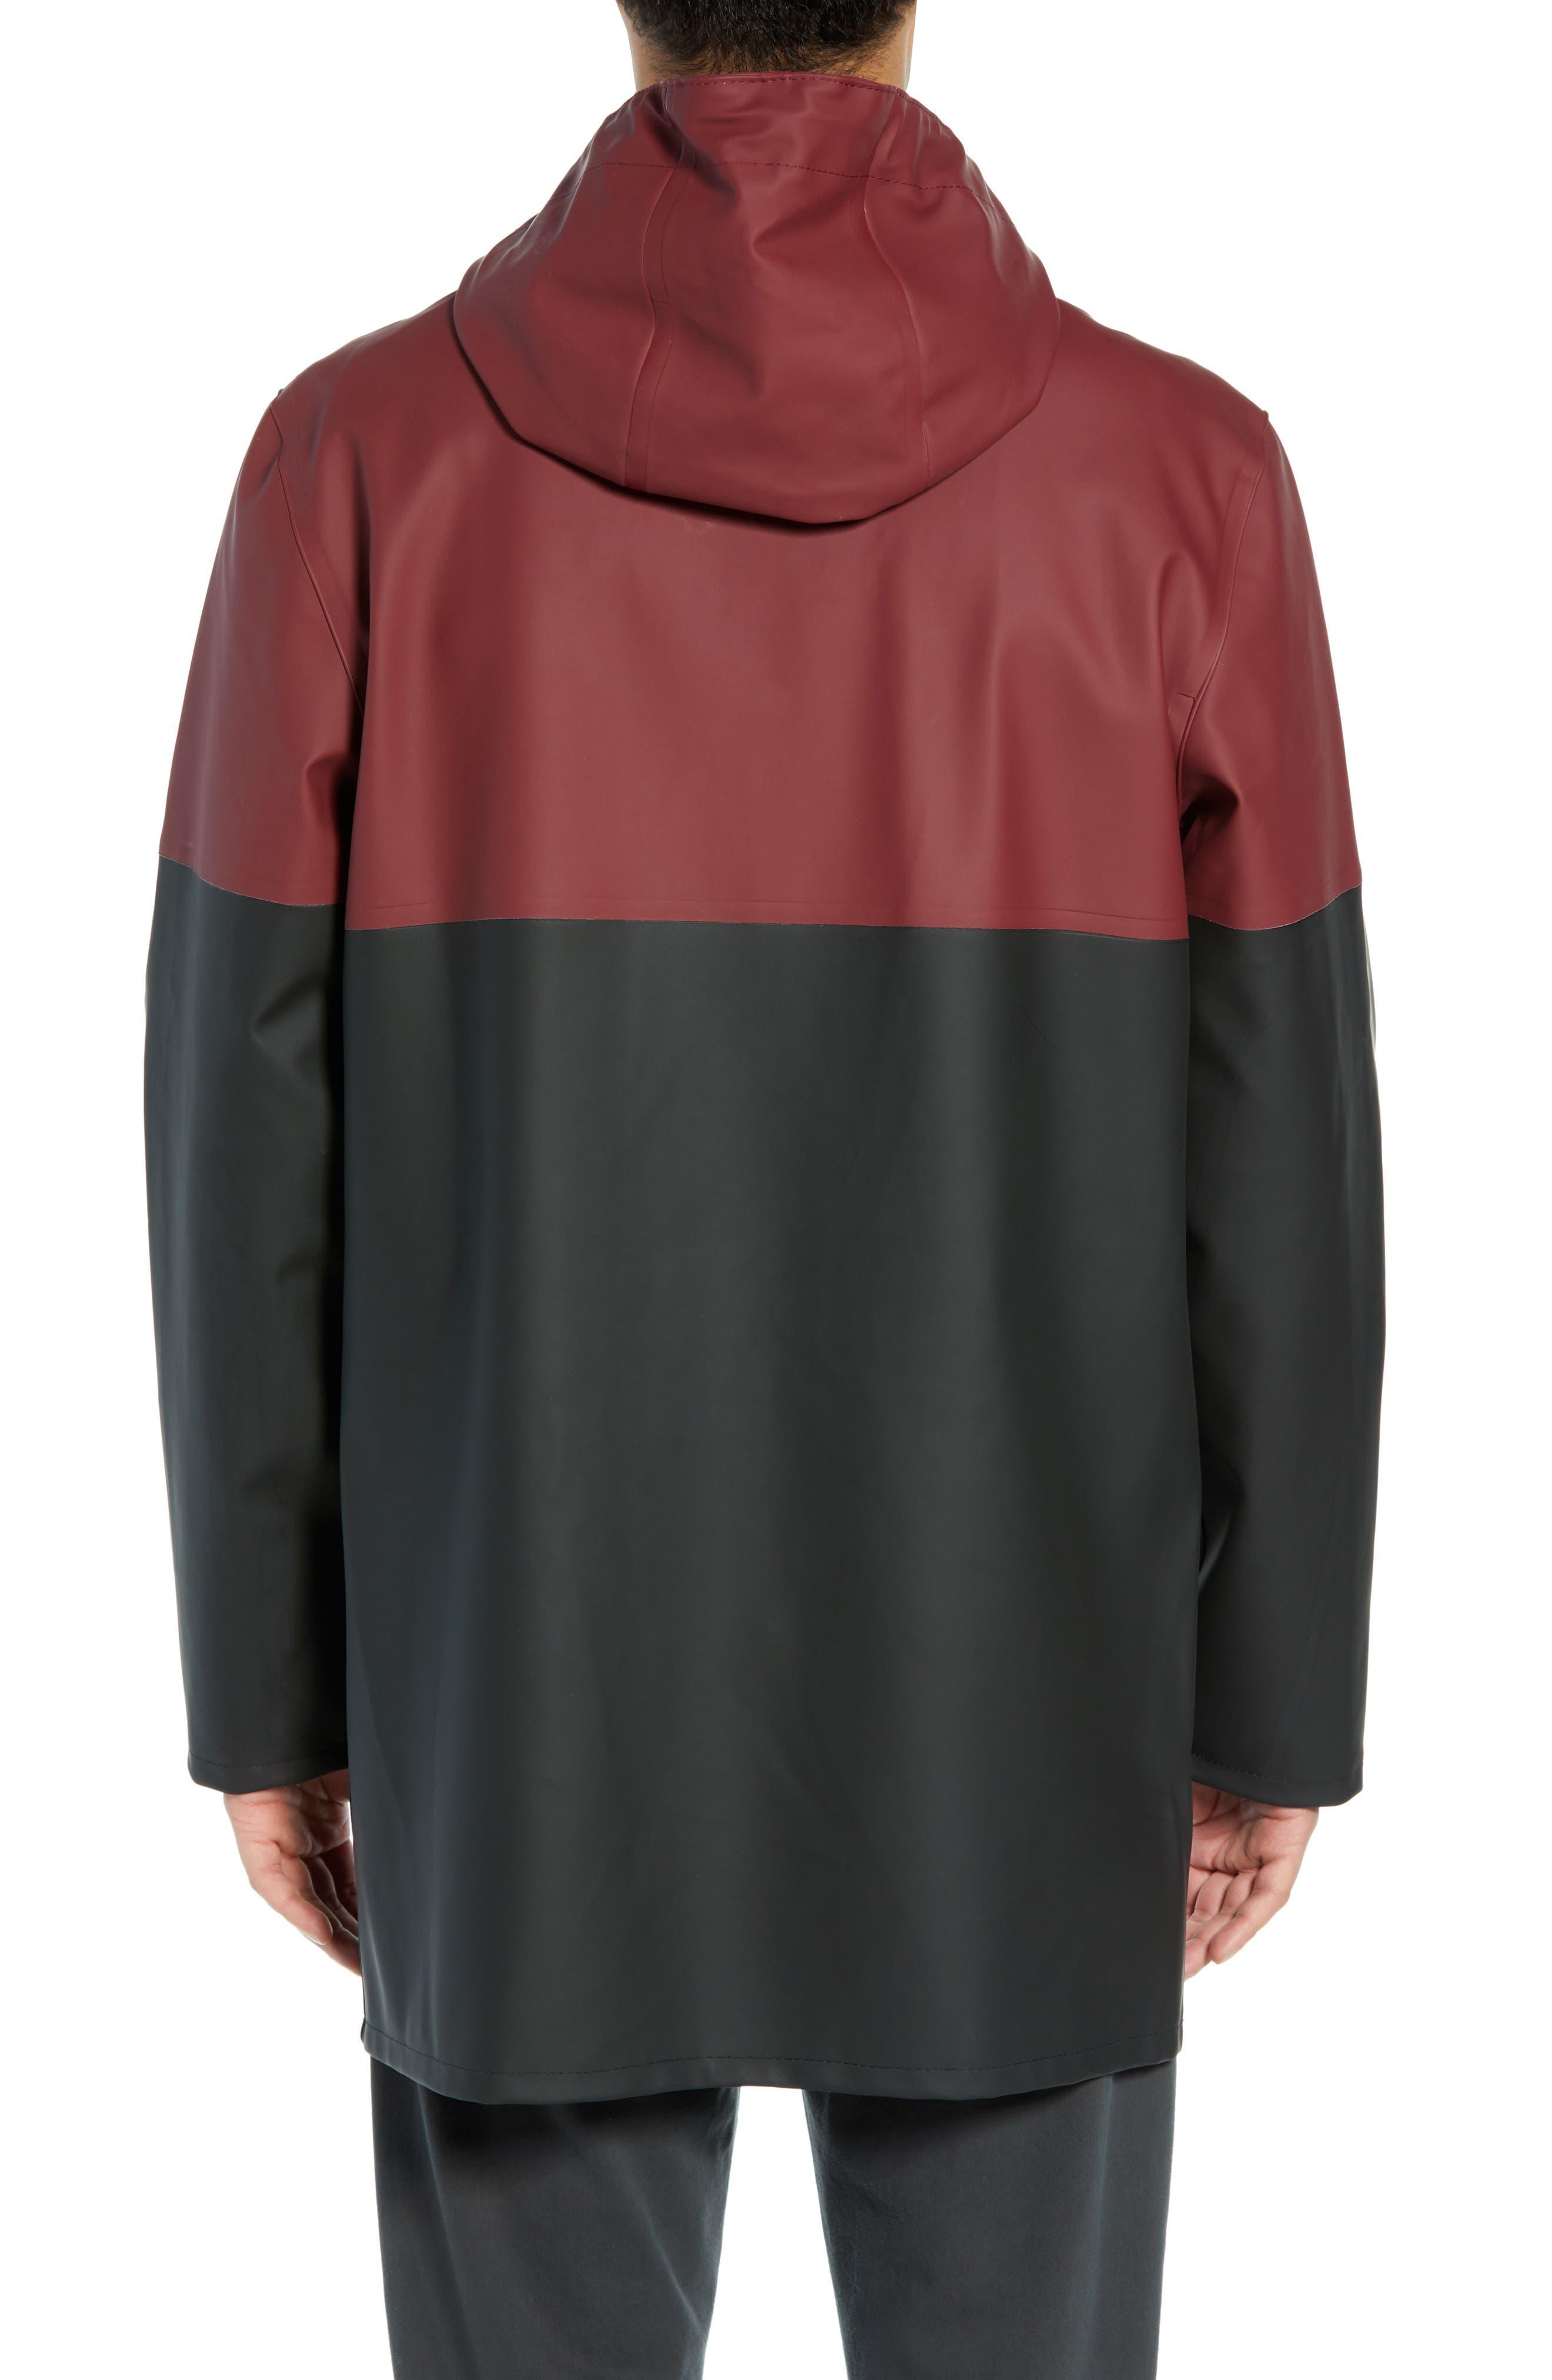 Stockholm Colorblock Waterproof Hooded Raincoat,                             Alternate thumbnail 2, color,                             BURGUNDY/ BLACK